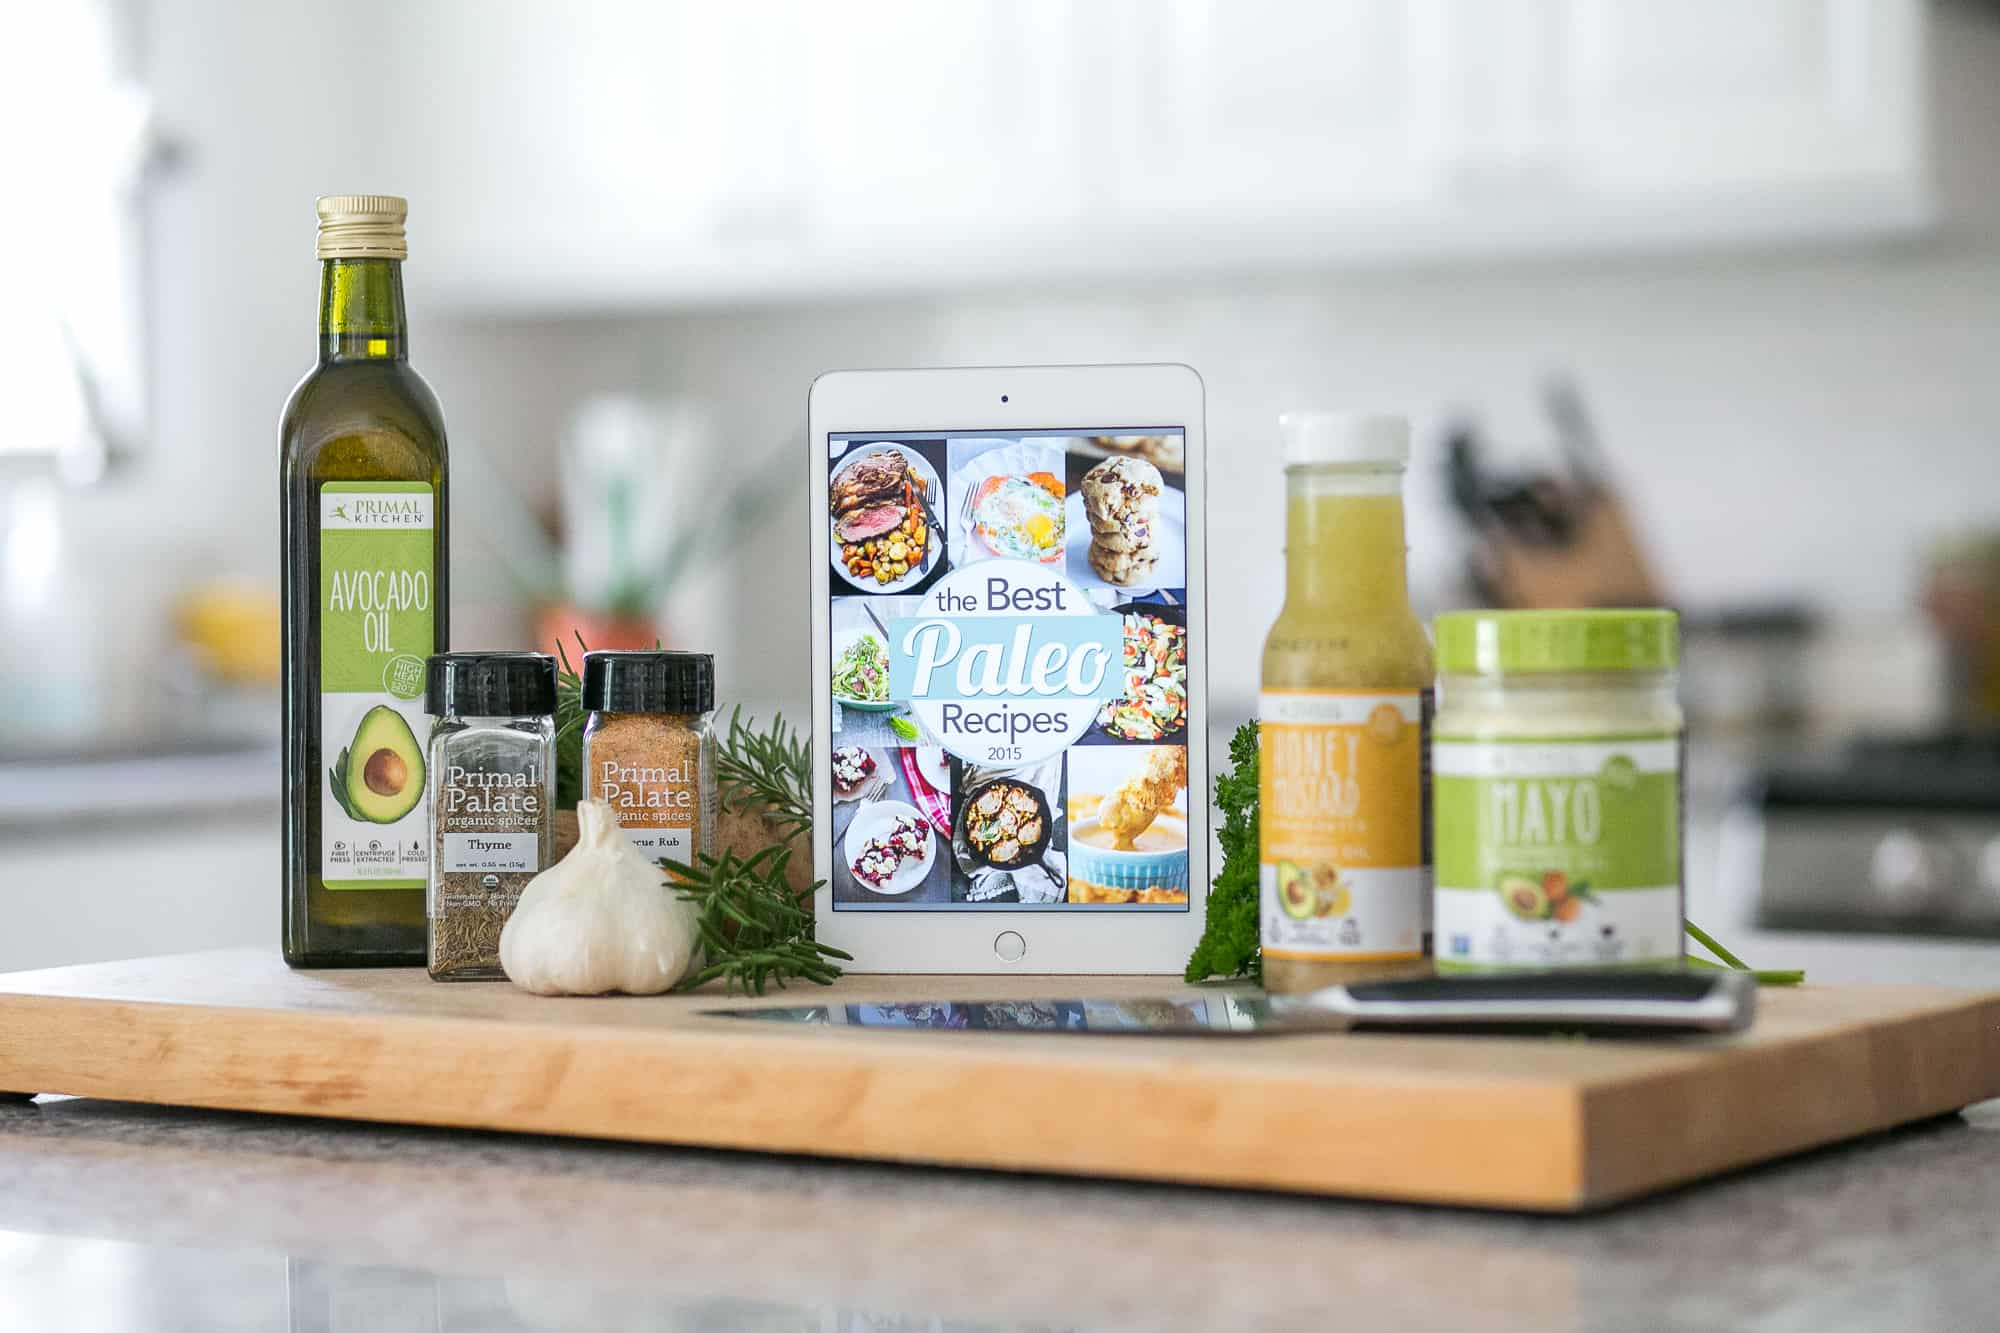 Best Paleo Recipes 2015 - Kitchen-303